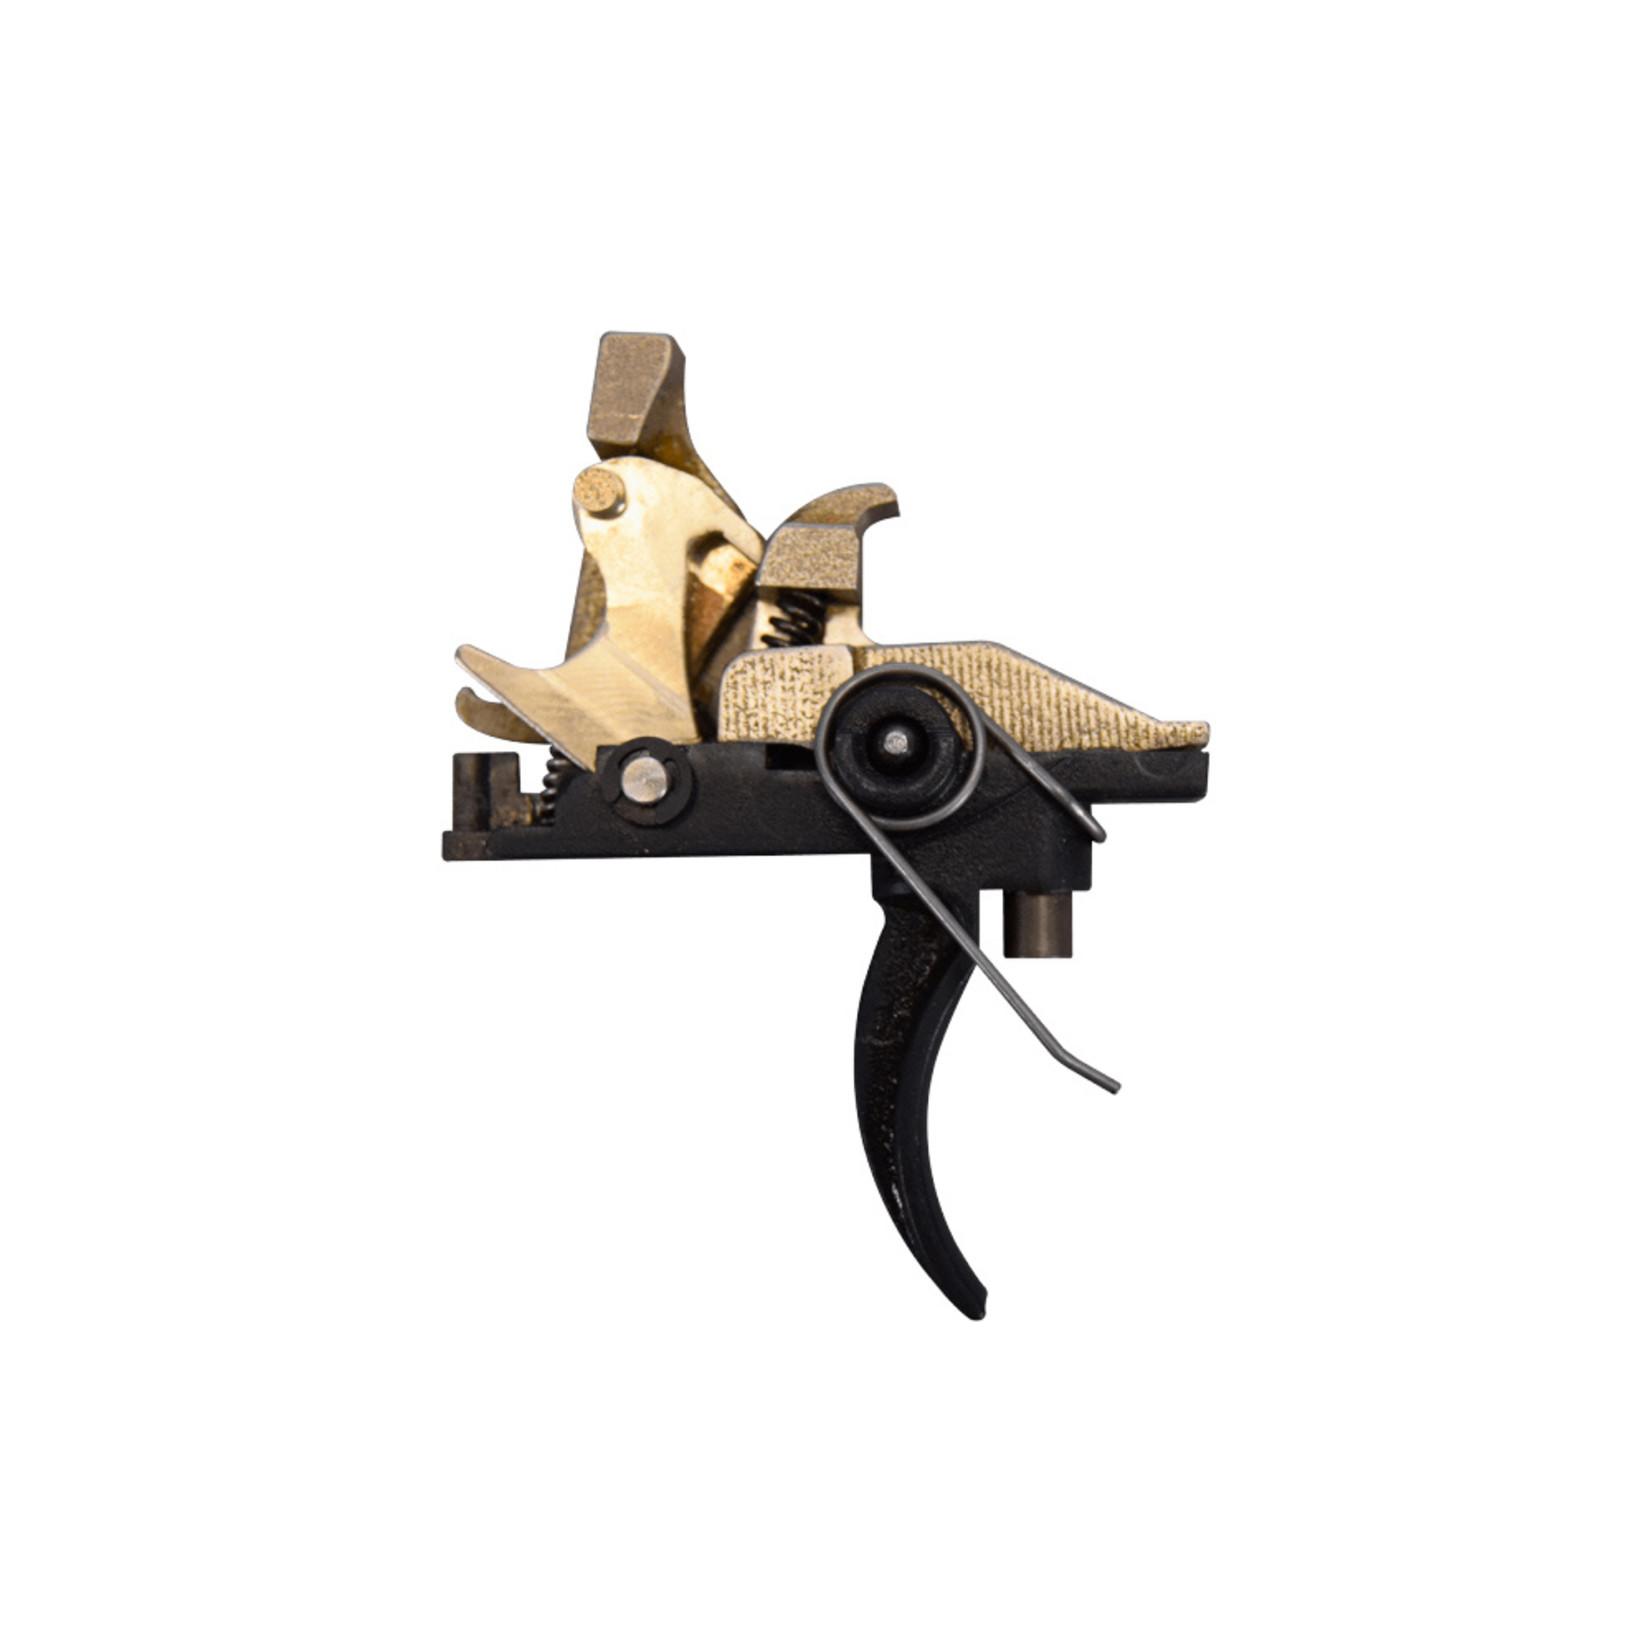 ECHO SPORT TRIGGER AR-15